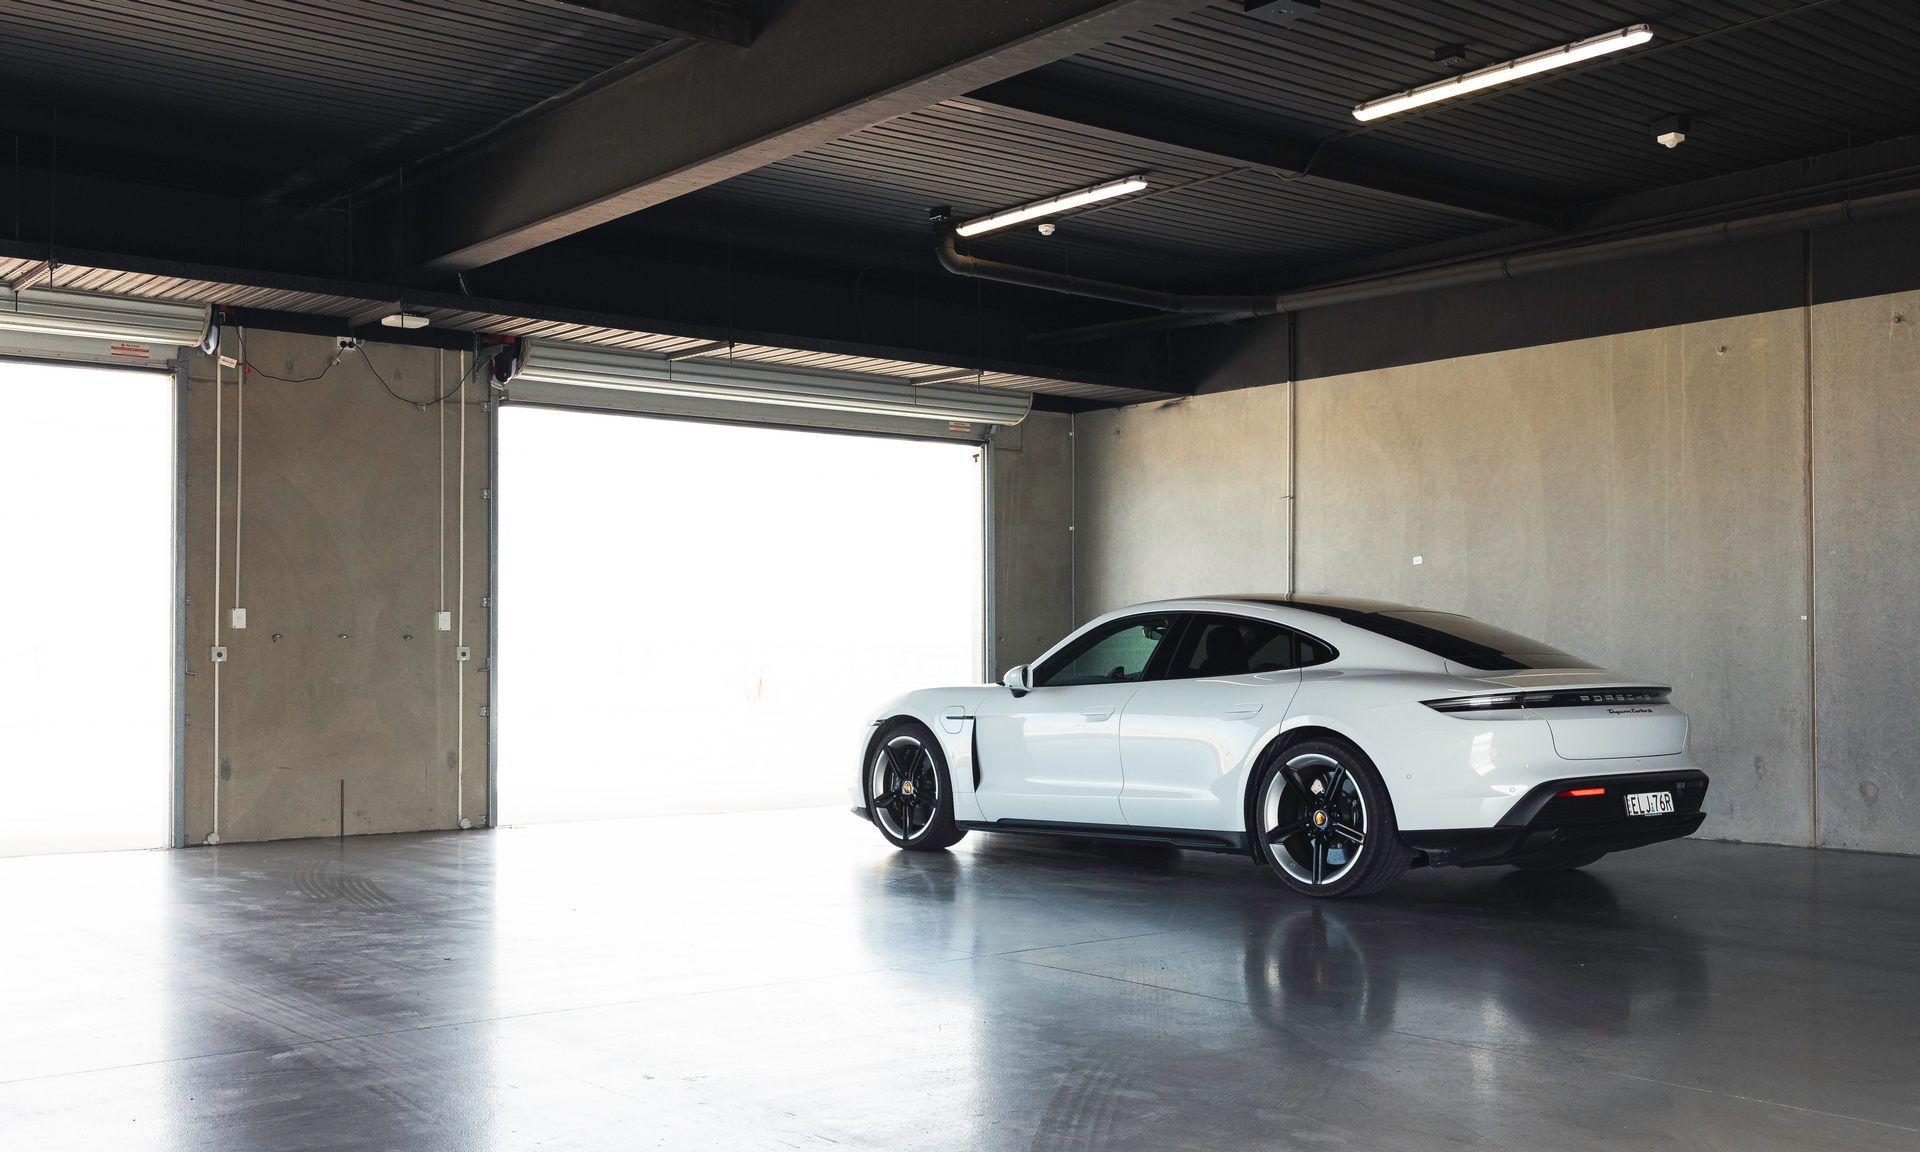 Porsche-Taycan-Turbo-S-The-Bend-Motorsport-Park-21